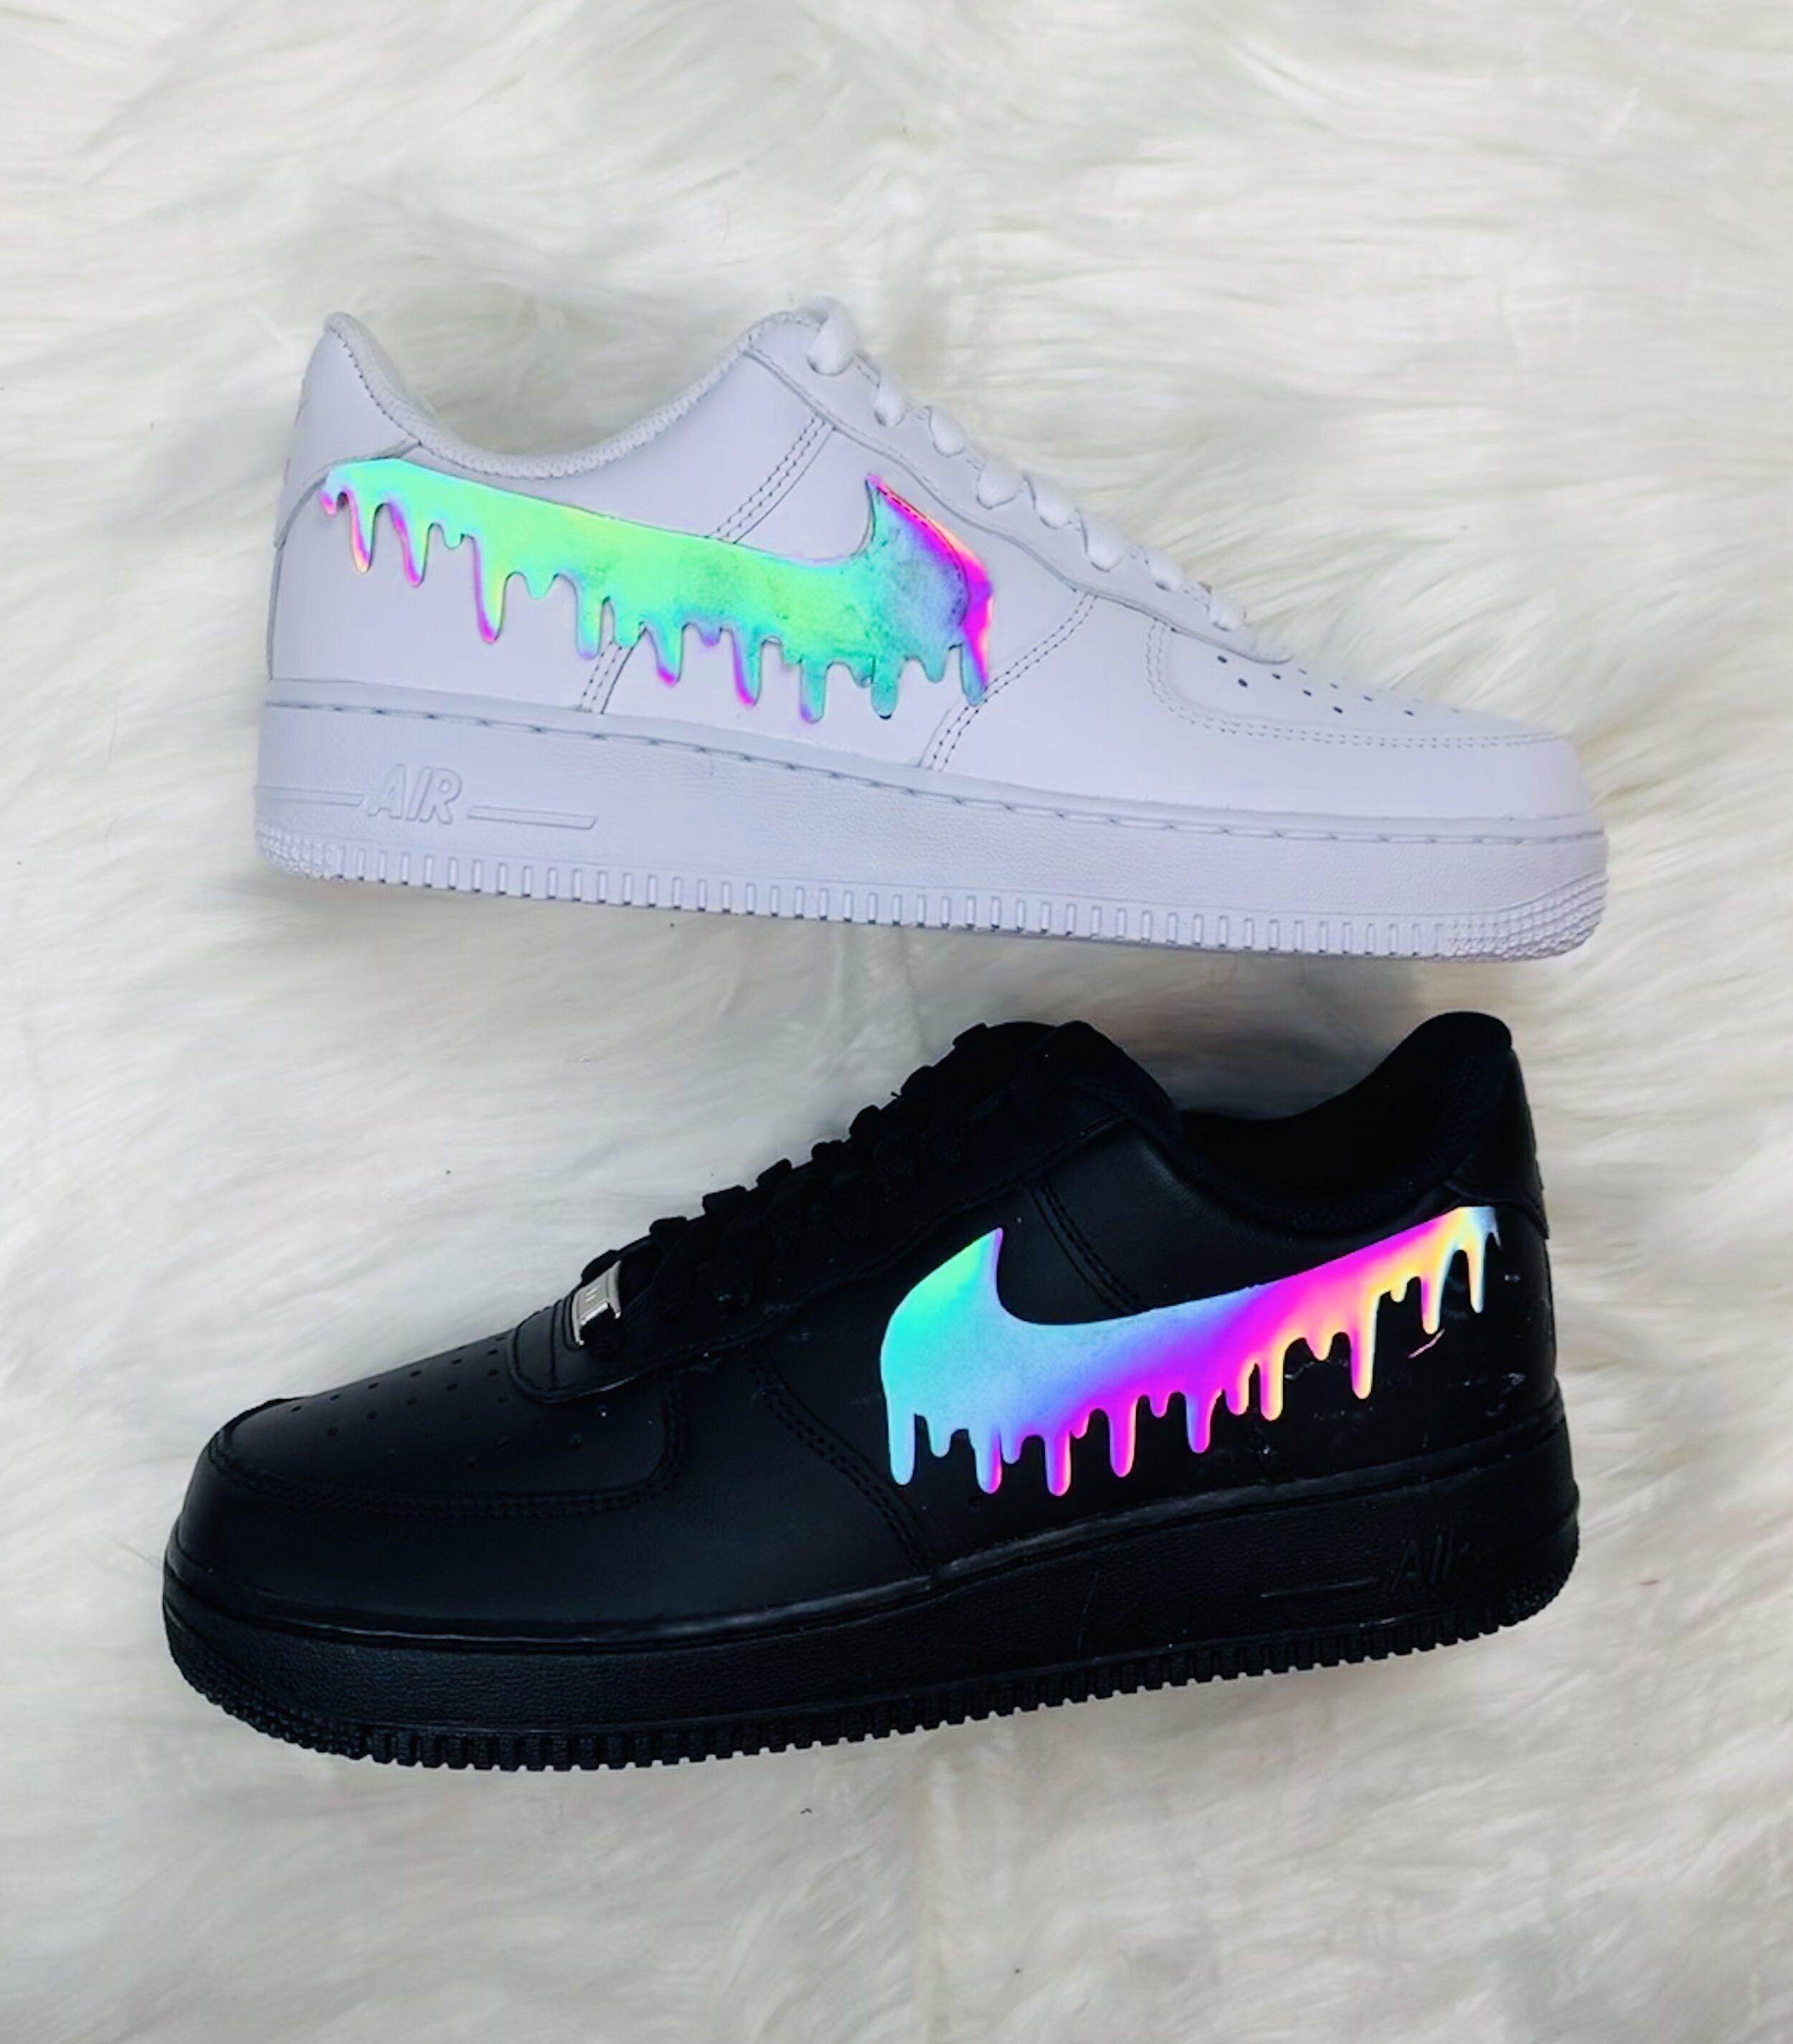 Fai da te Nike Air Force Custom / Iron On Heat Transfer / Vinyl Stickers / Rainbow Iridescent Drip / 3M Reflective/Holographic Shoes/ Custom AF1